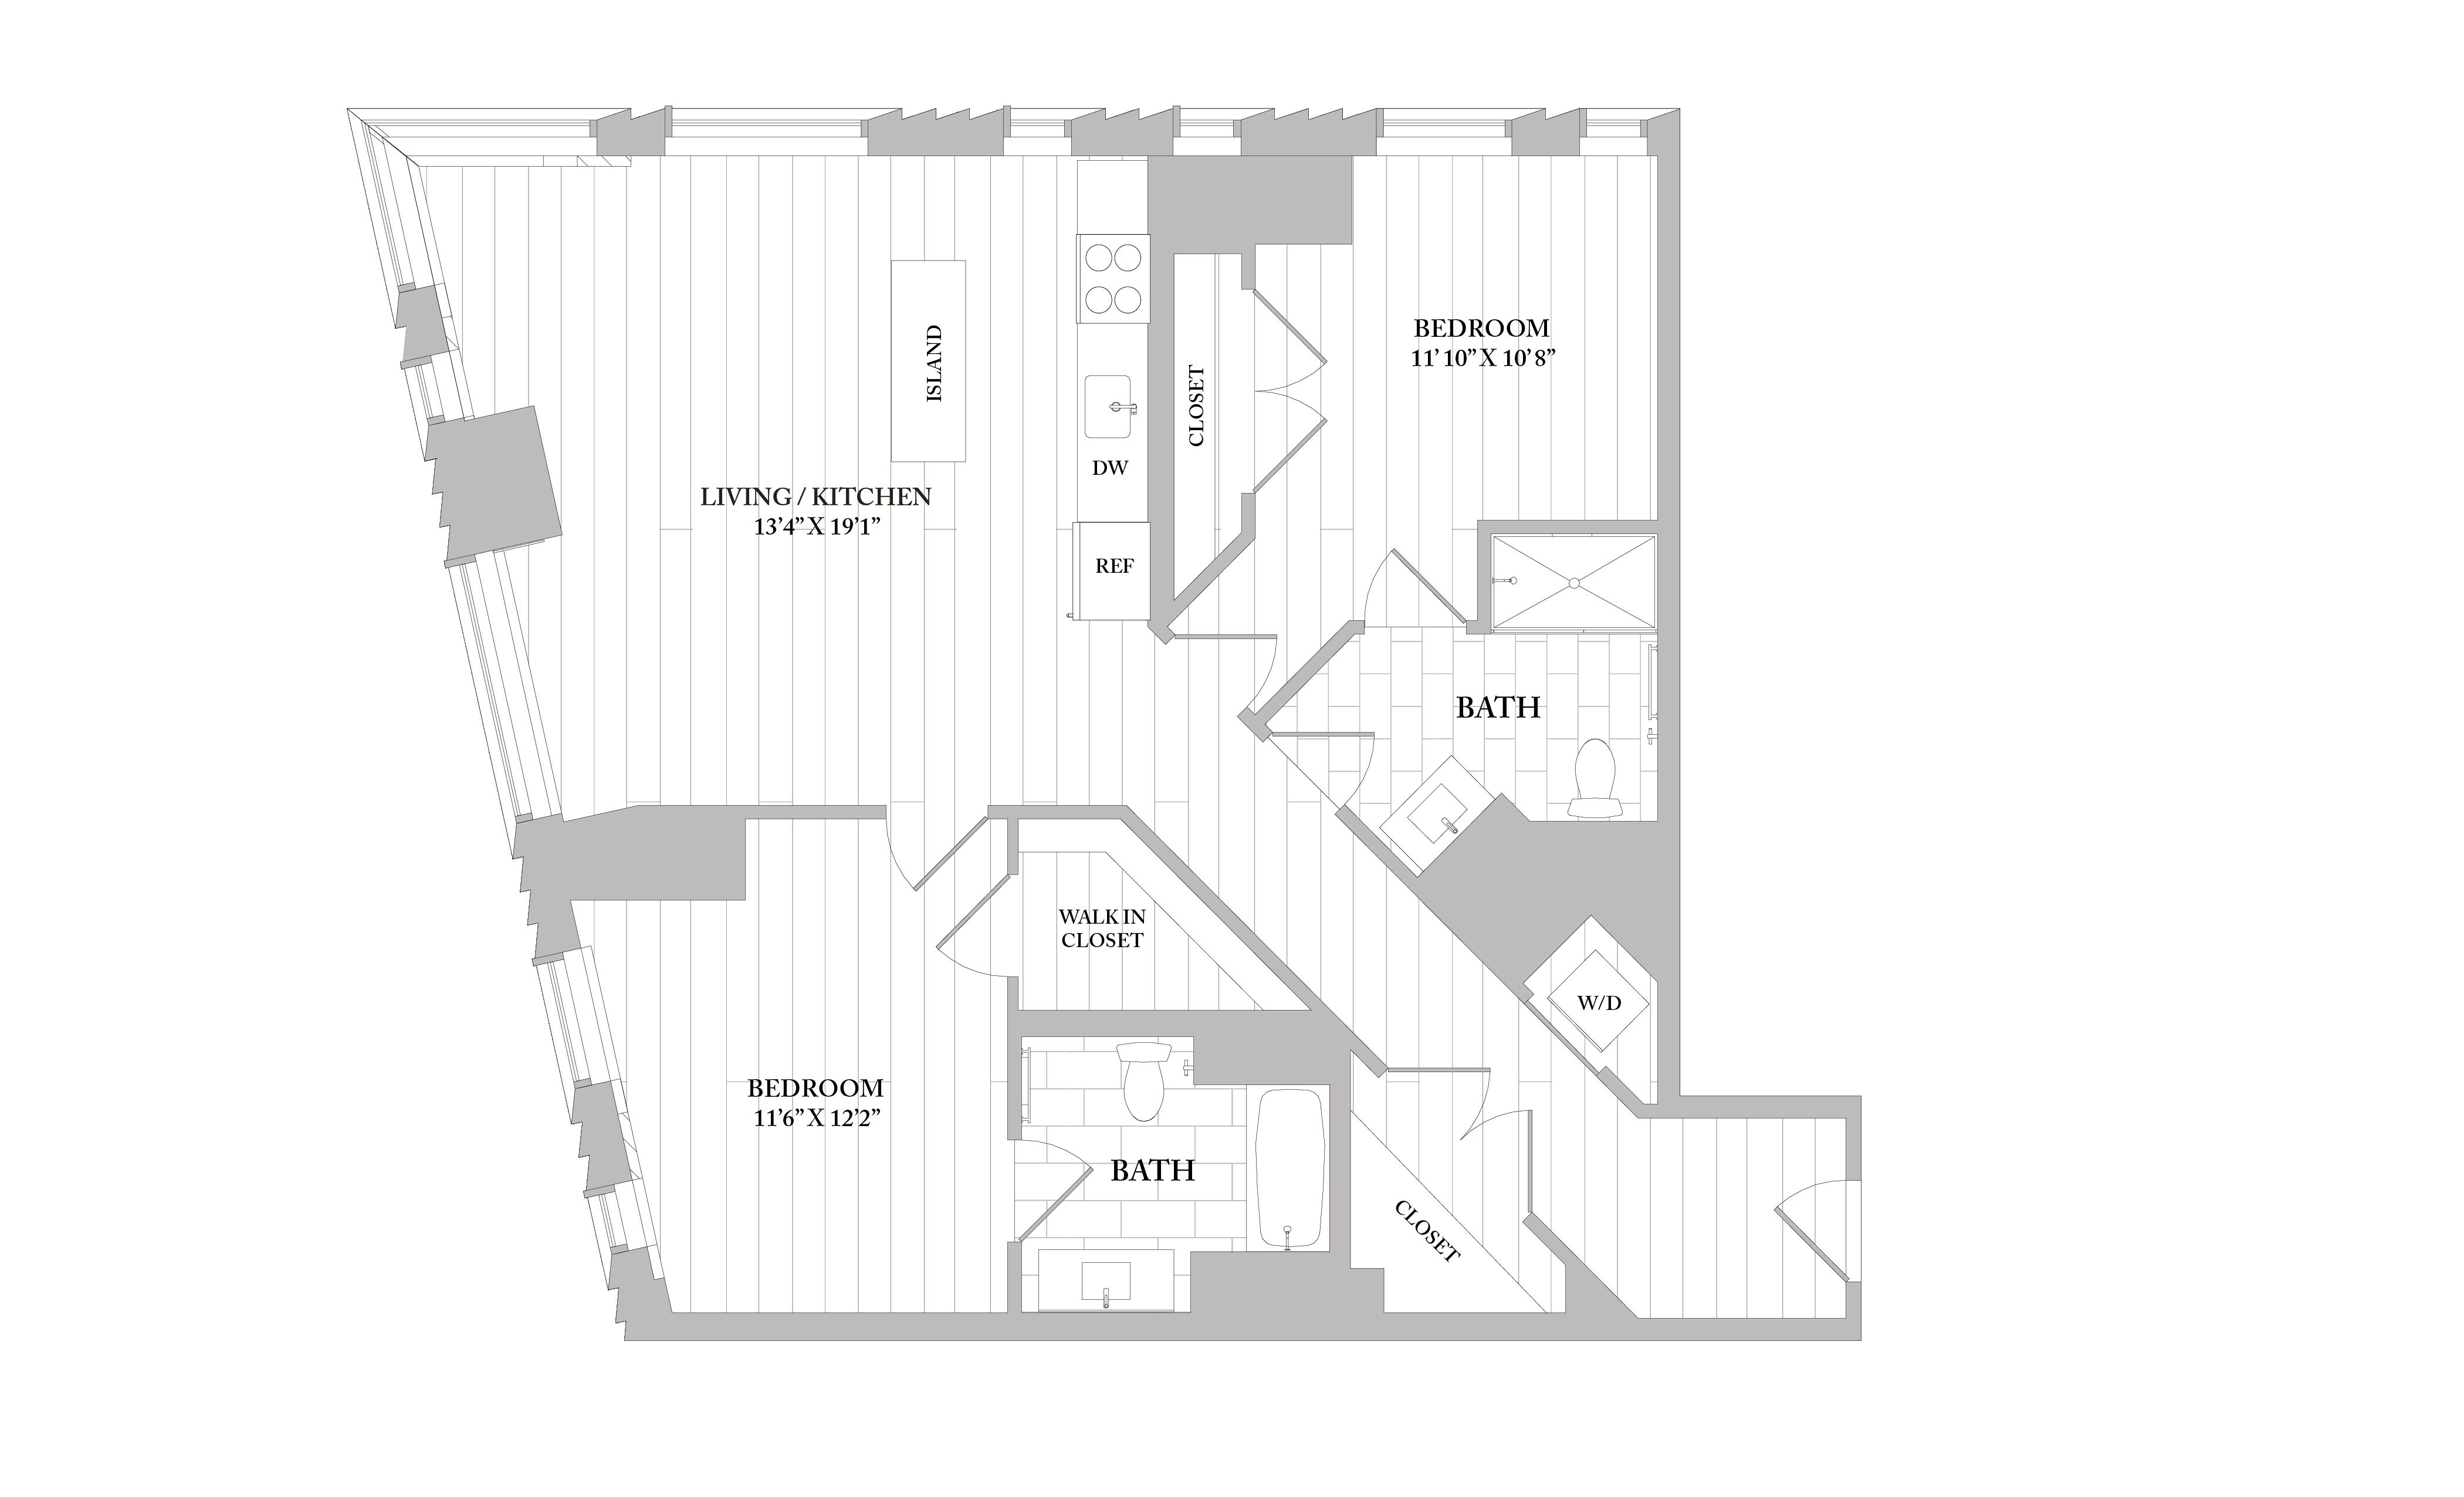 Apartment 2511 floorplan